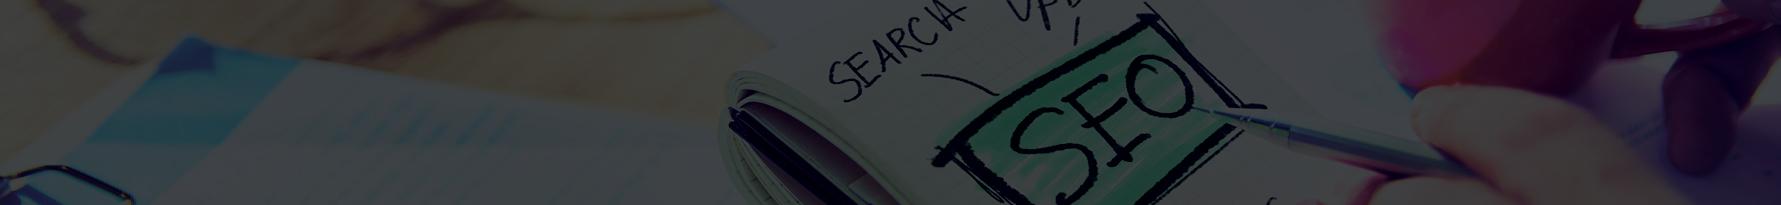 Web AlchLab | Web Agency Bologna